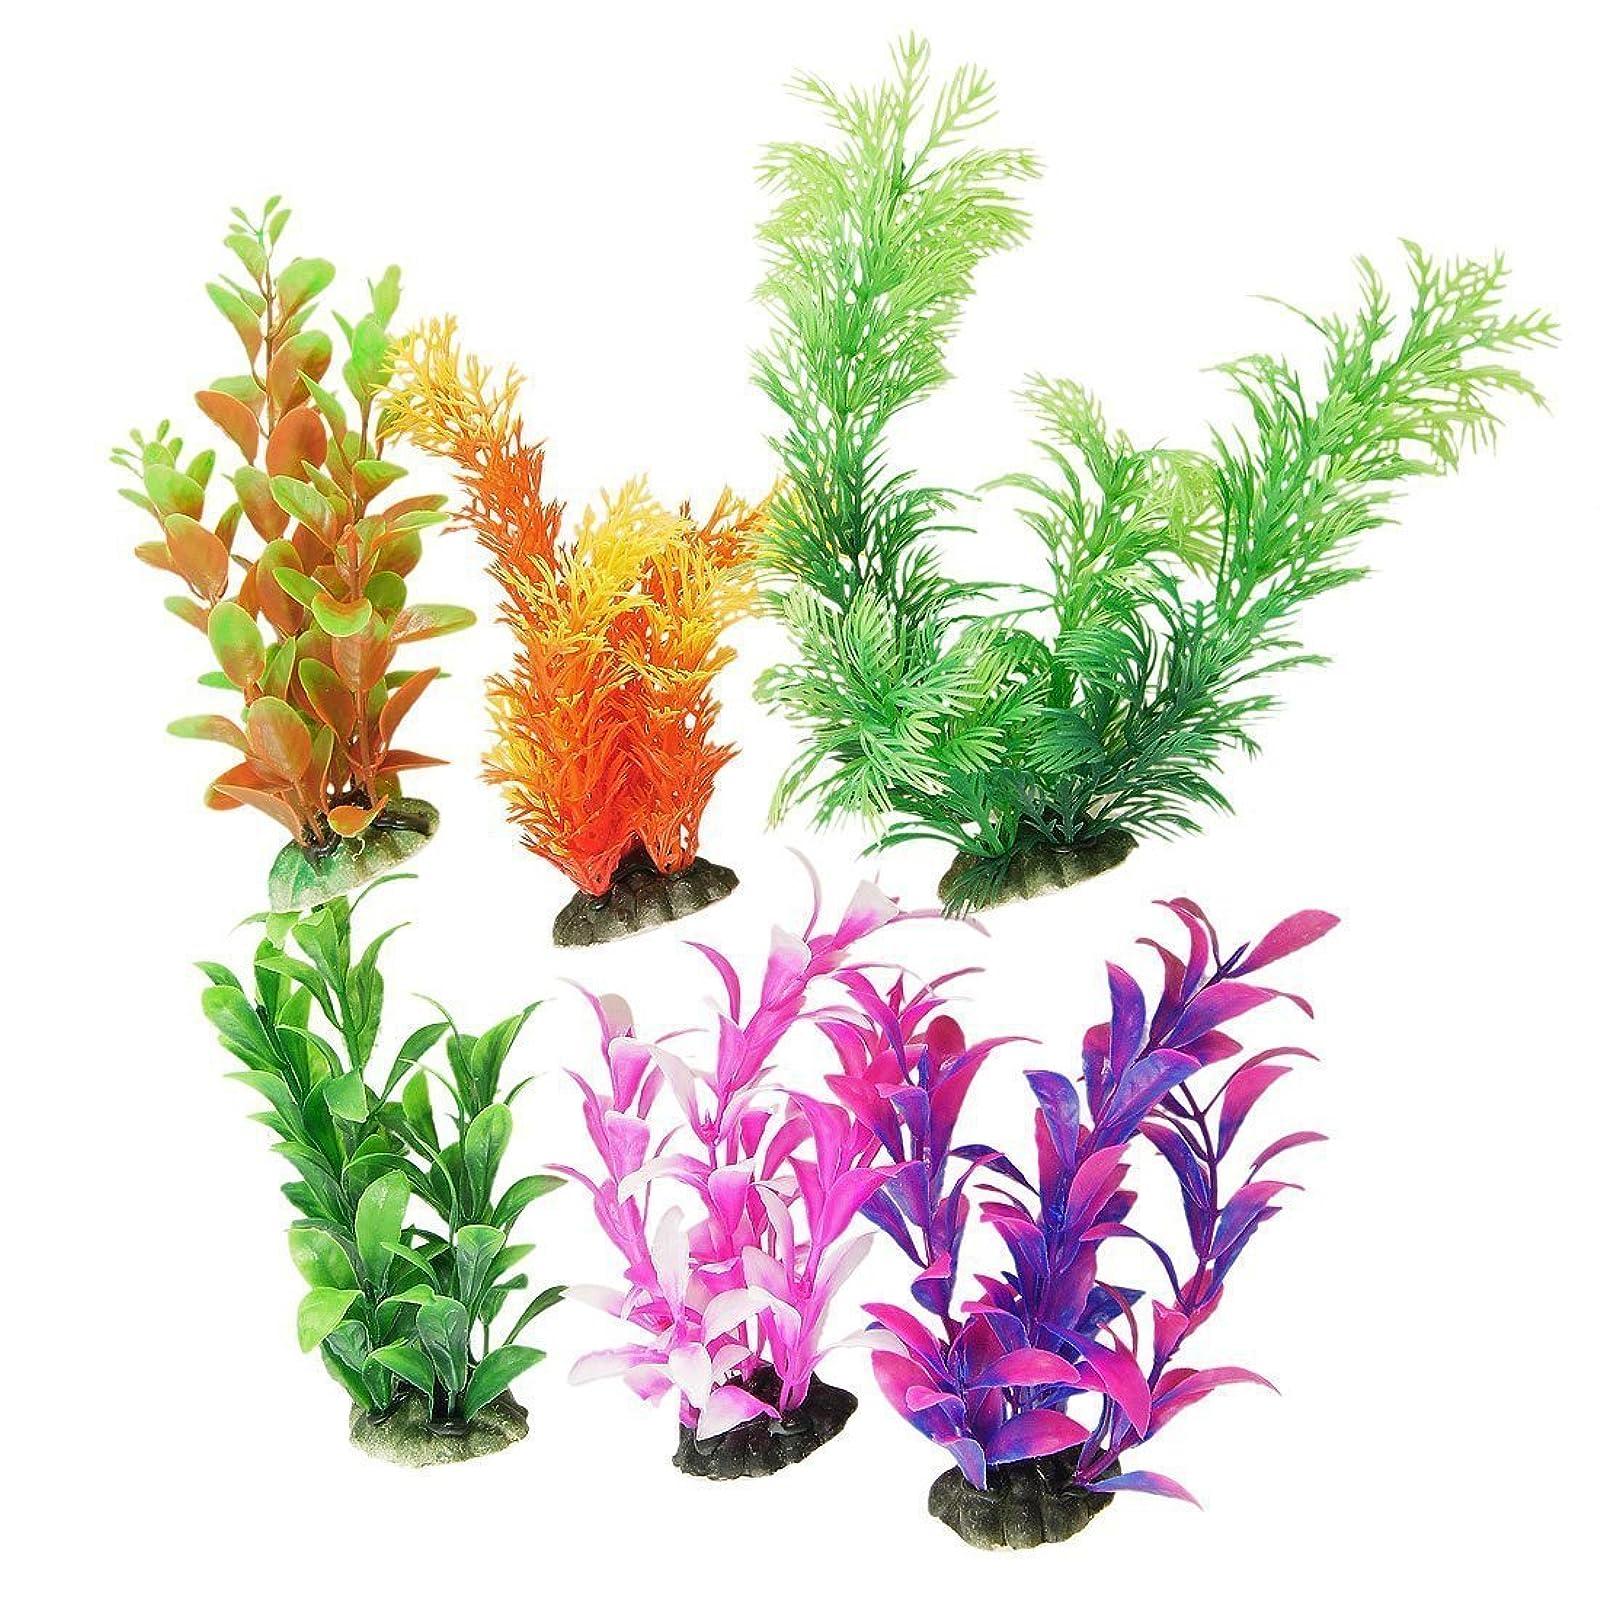 YOY Aquarium Decor Fish Tank Decoration Ornament - 7